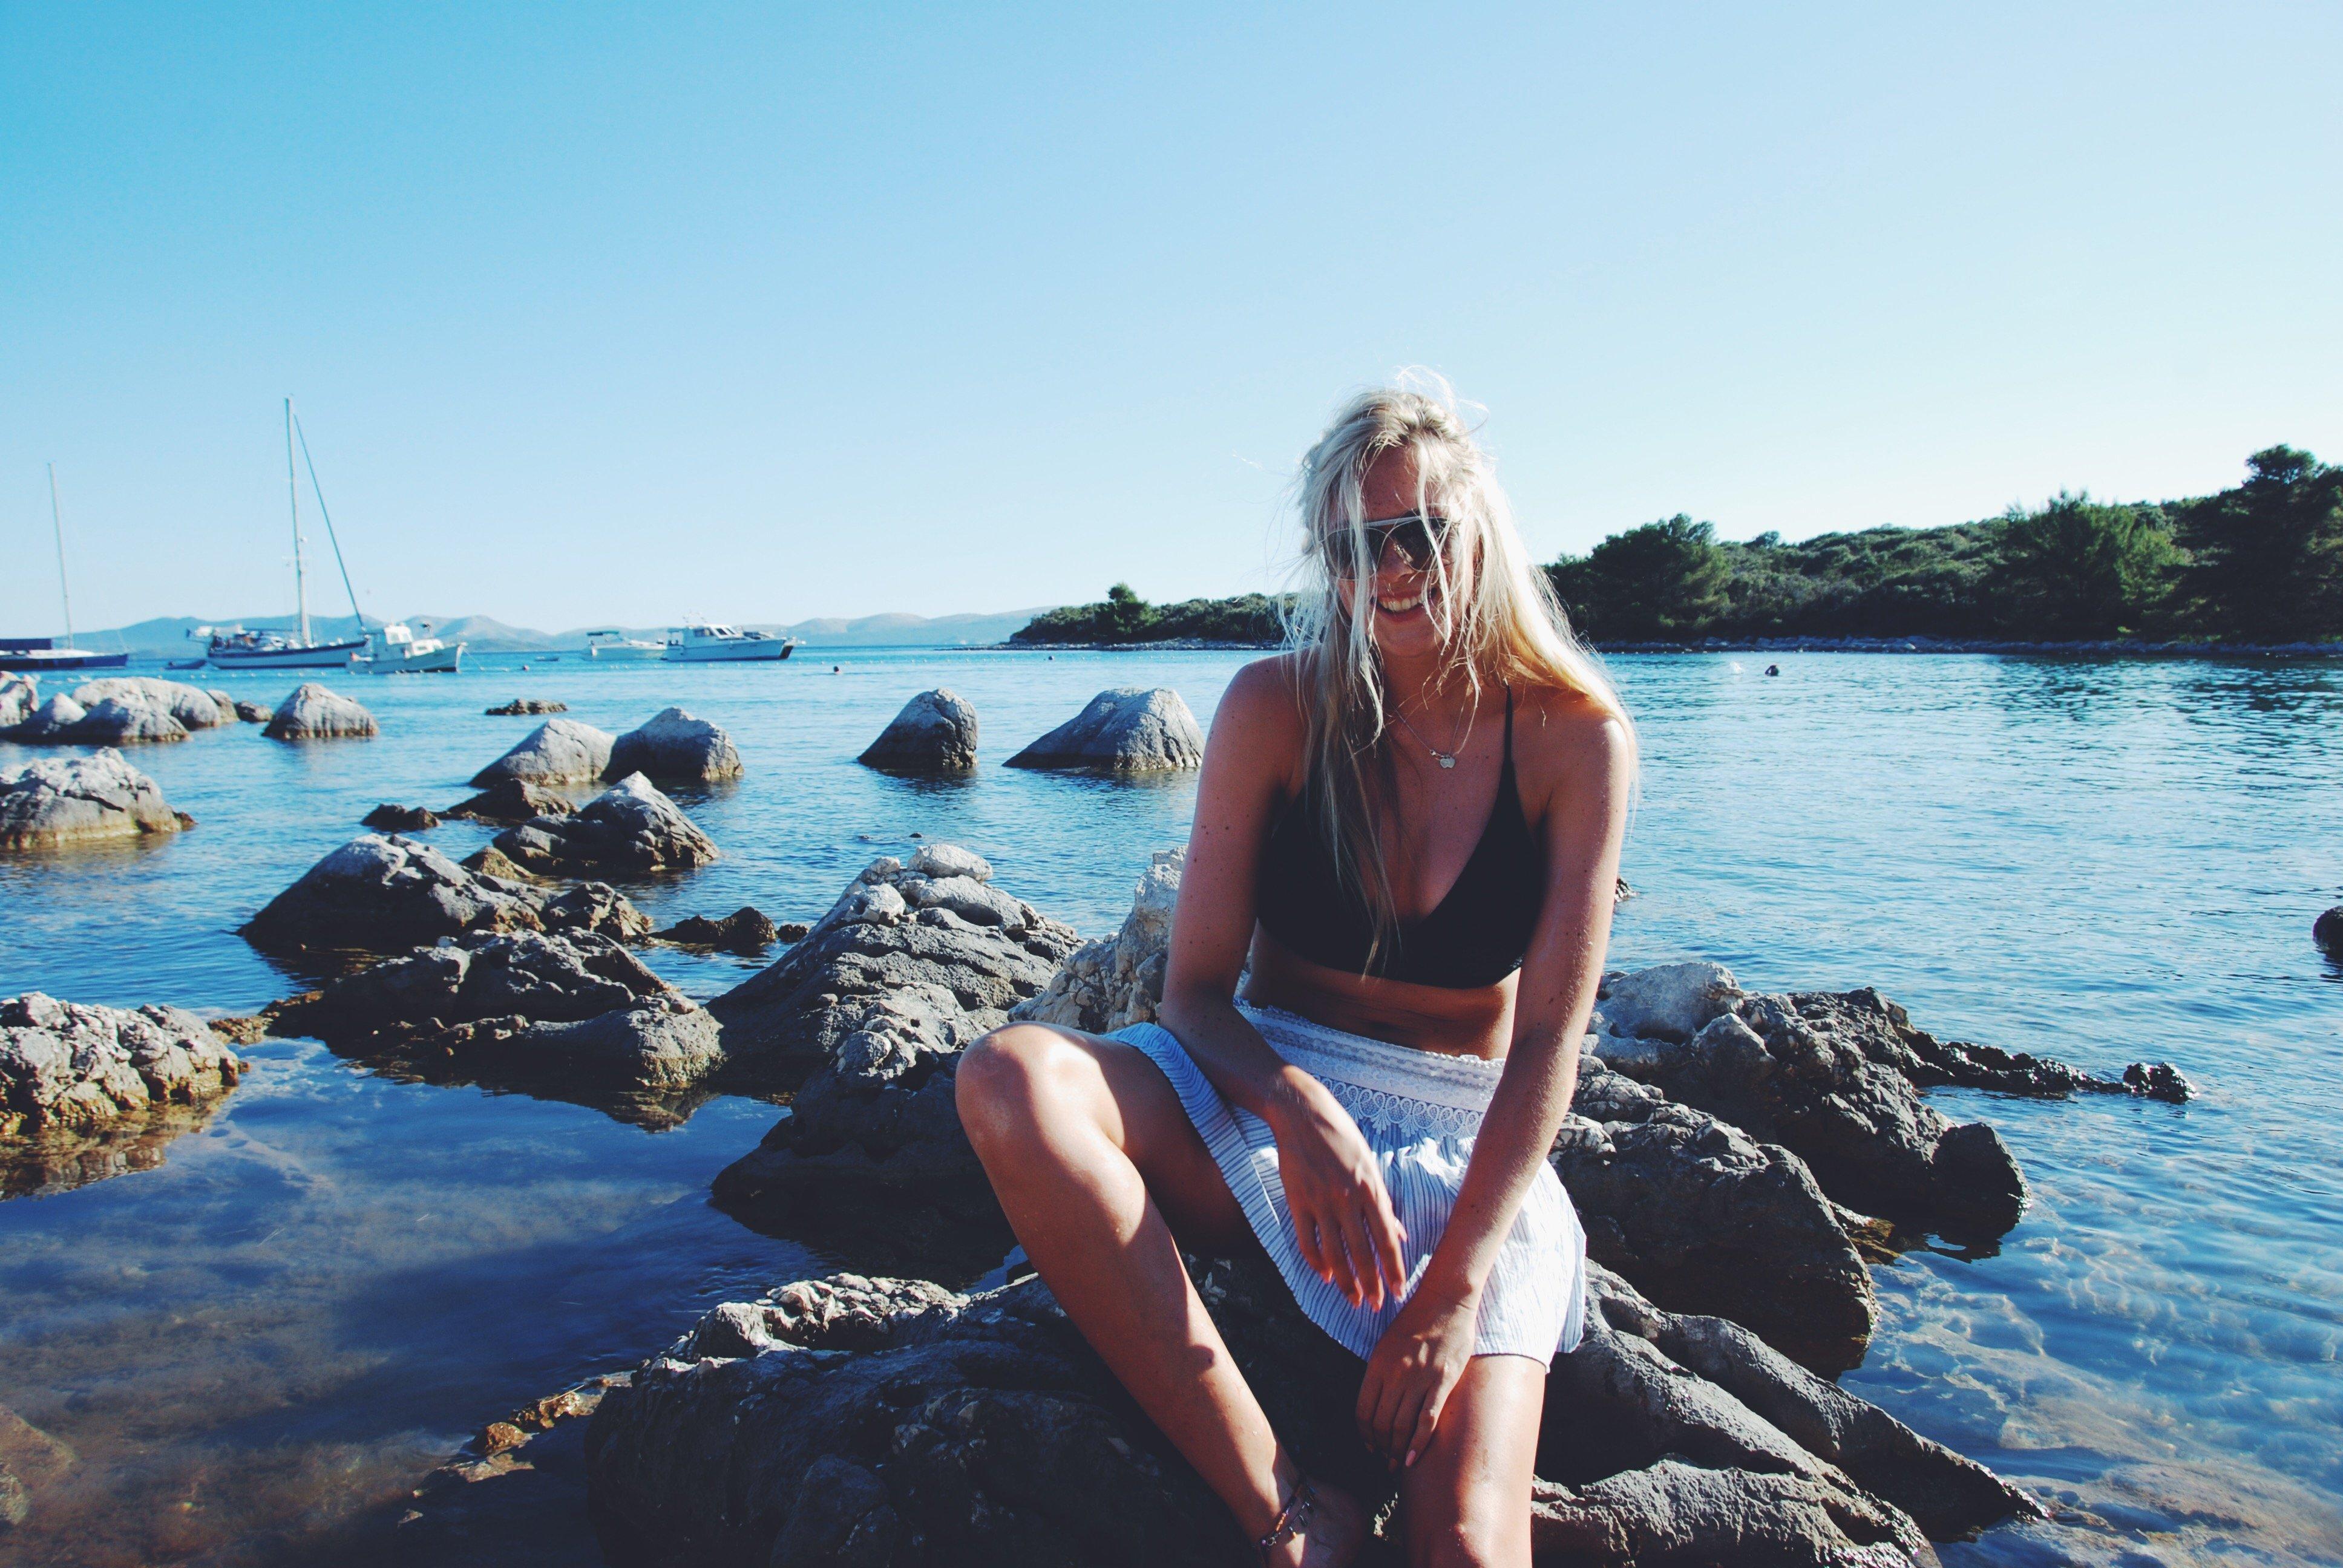 Muline - Croatia - The Good Rogue